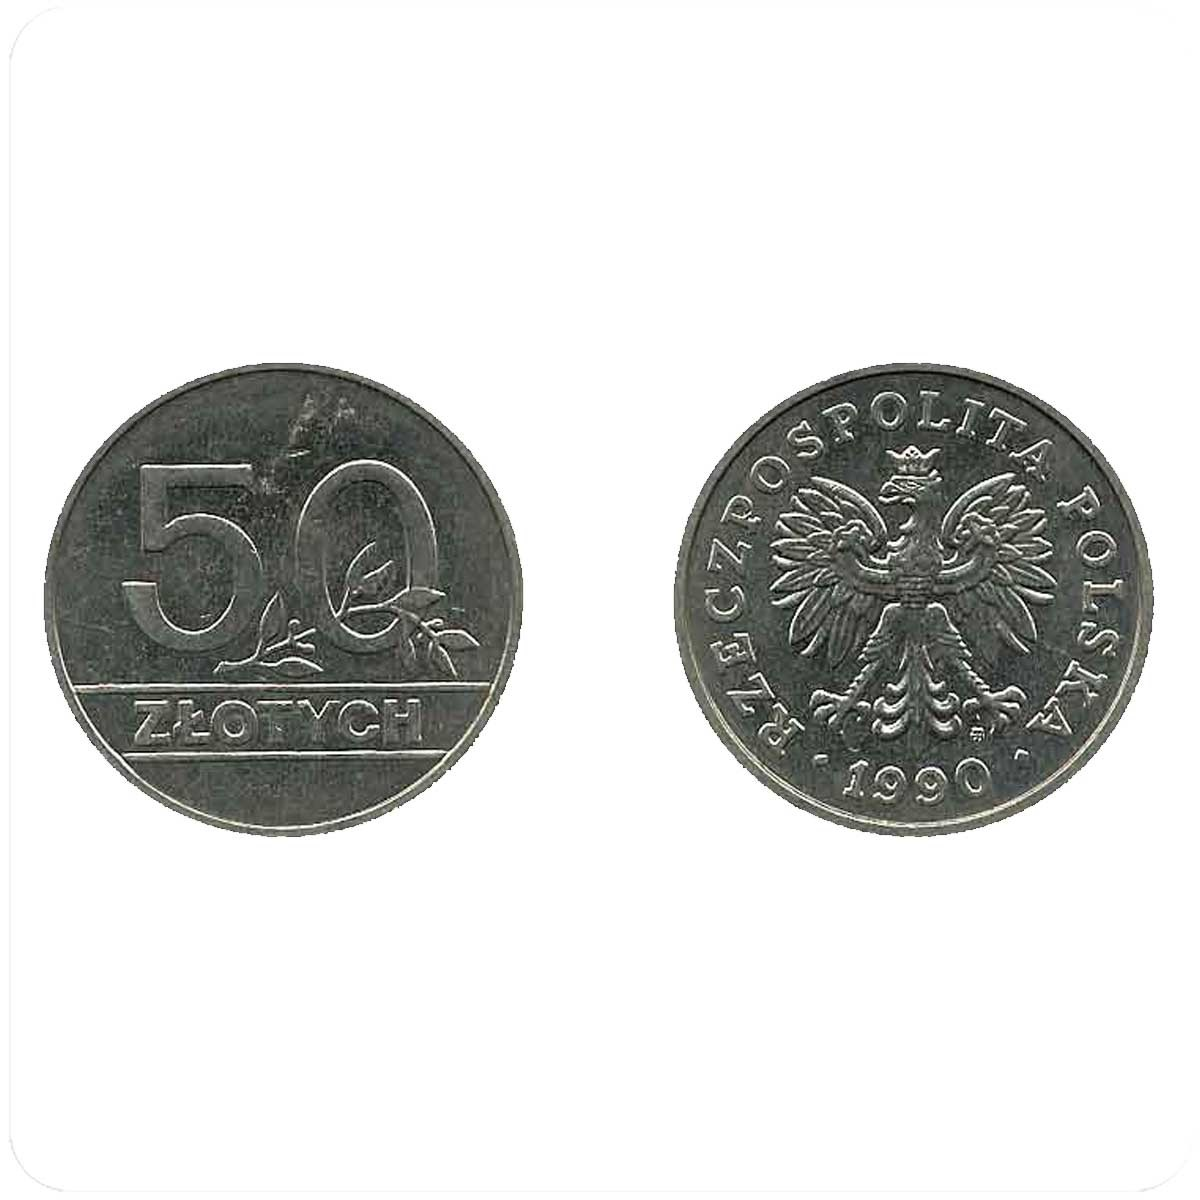 Rfnfkju vjytn gjkmib htuekzhyjuj xtrfyf сколько стоит монета 5 копеек украина 1992